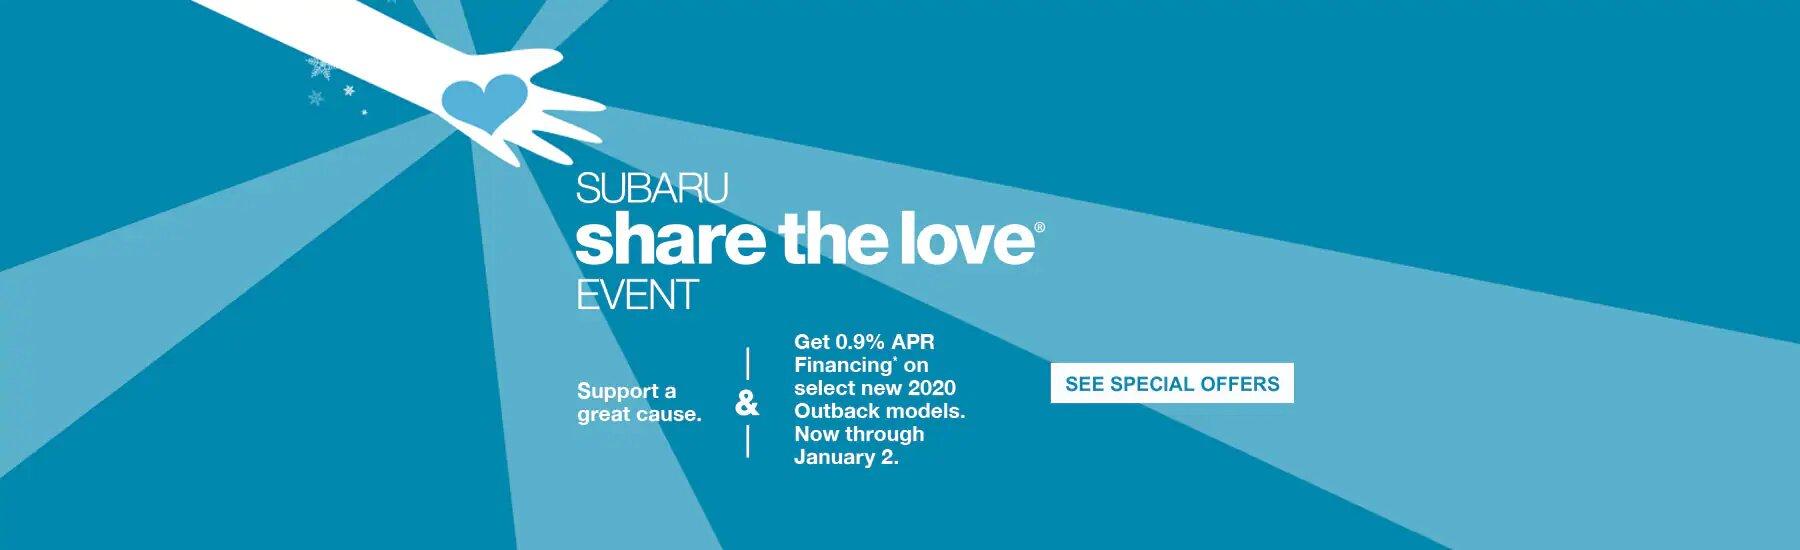 2019 Subaru Share the Love Event near Detroit MI